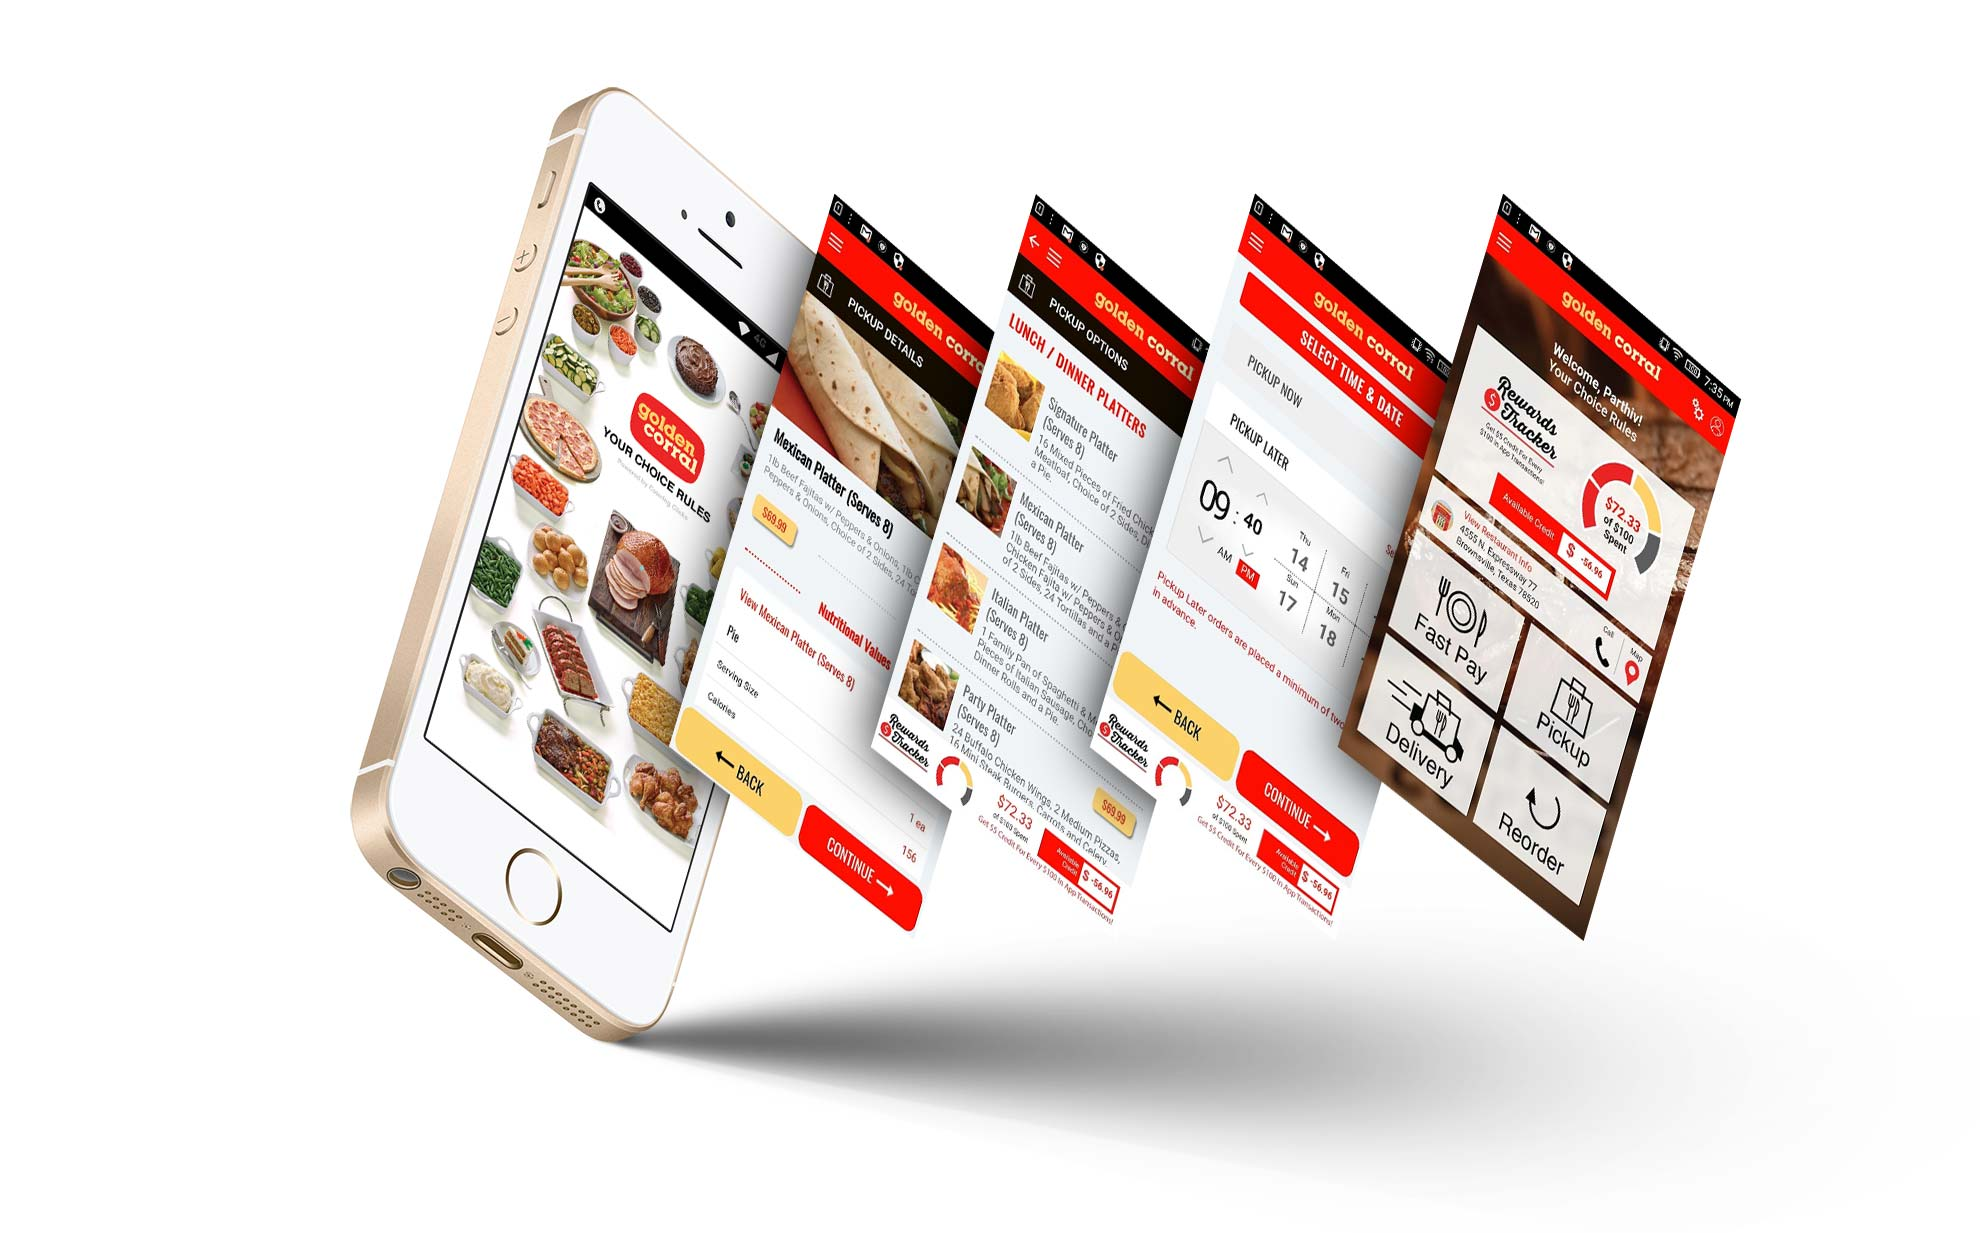 Golden Corral Brownsville - Restaurant App